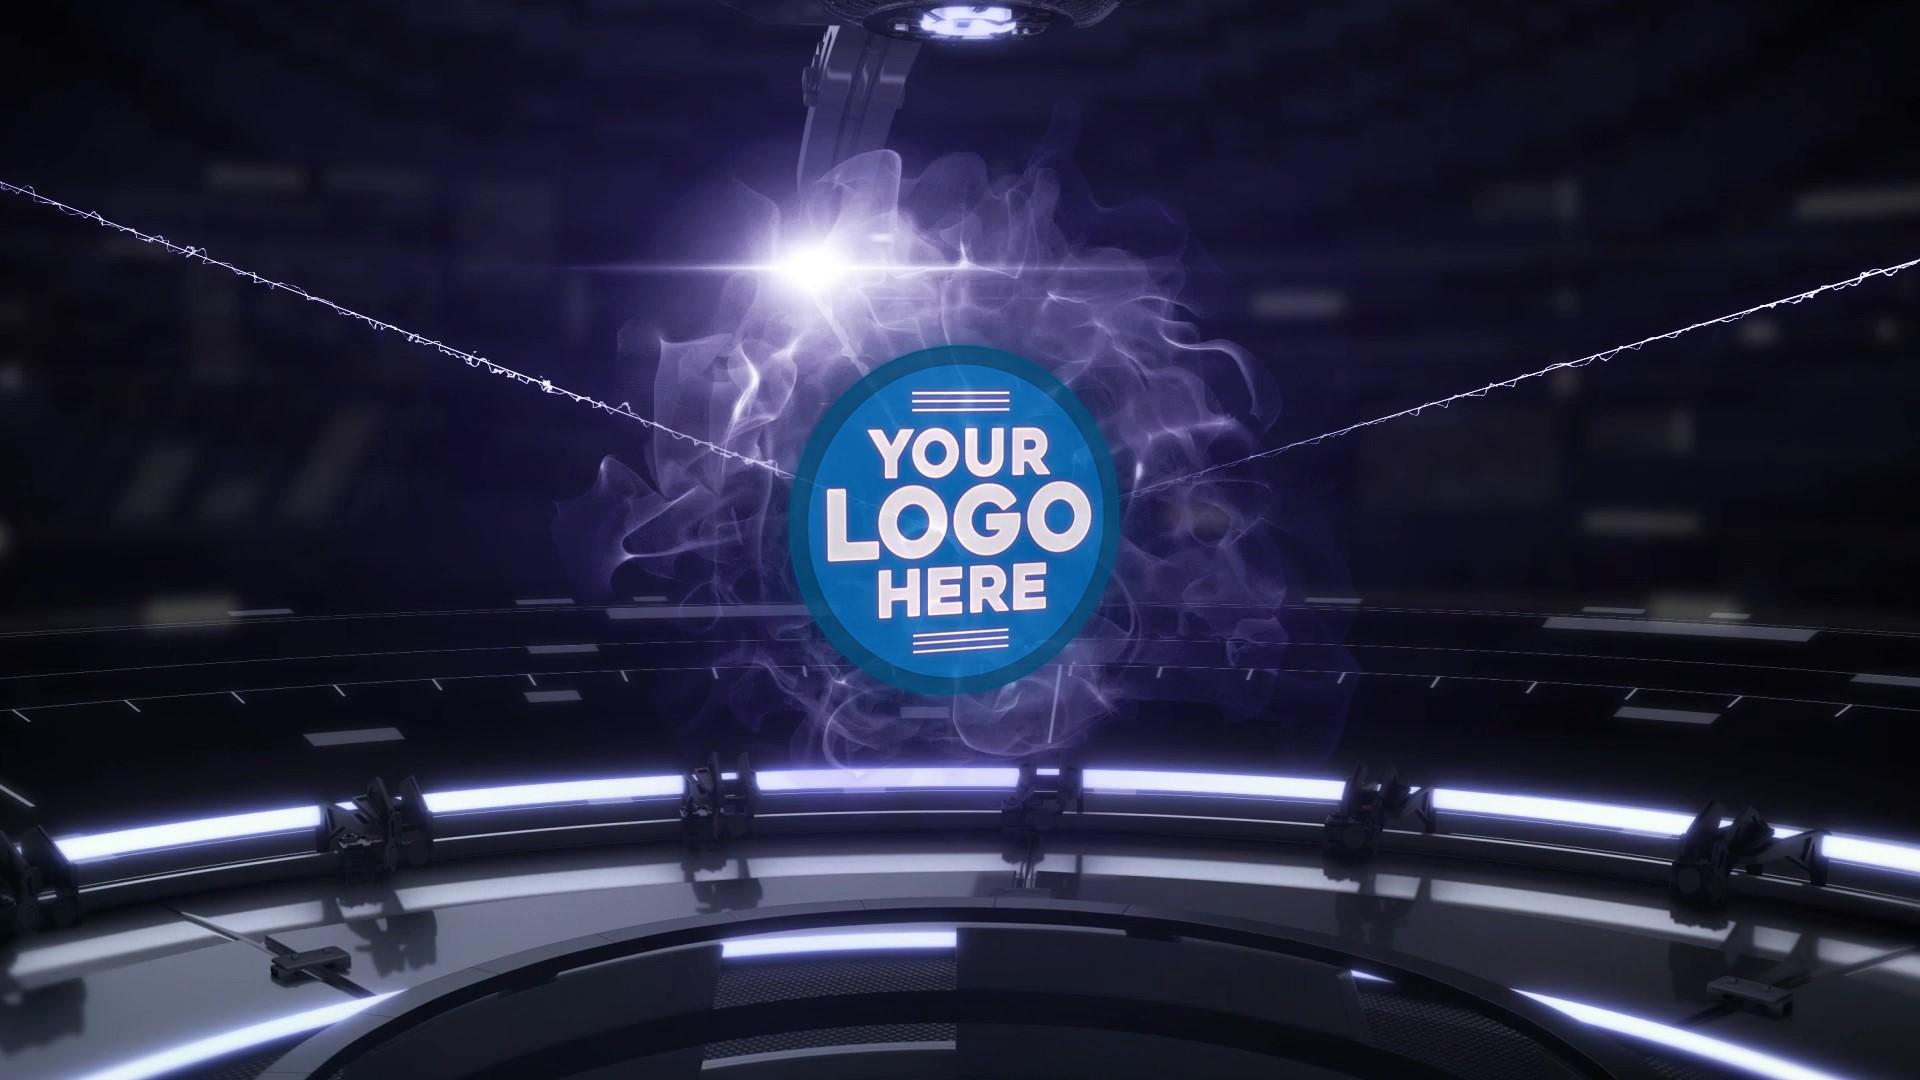 I will create 3 HD logo video intros